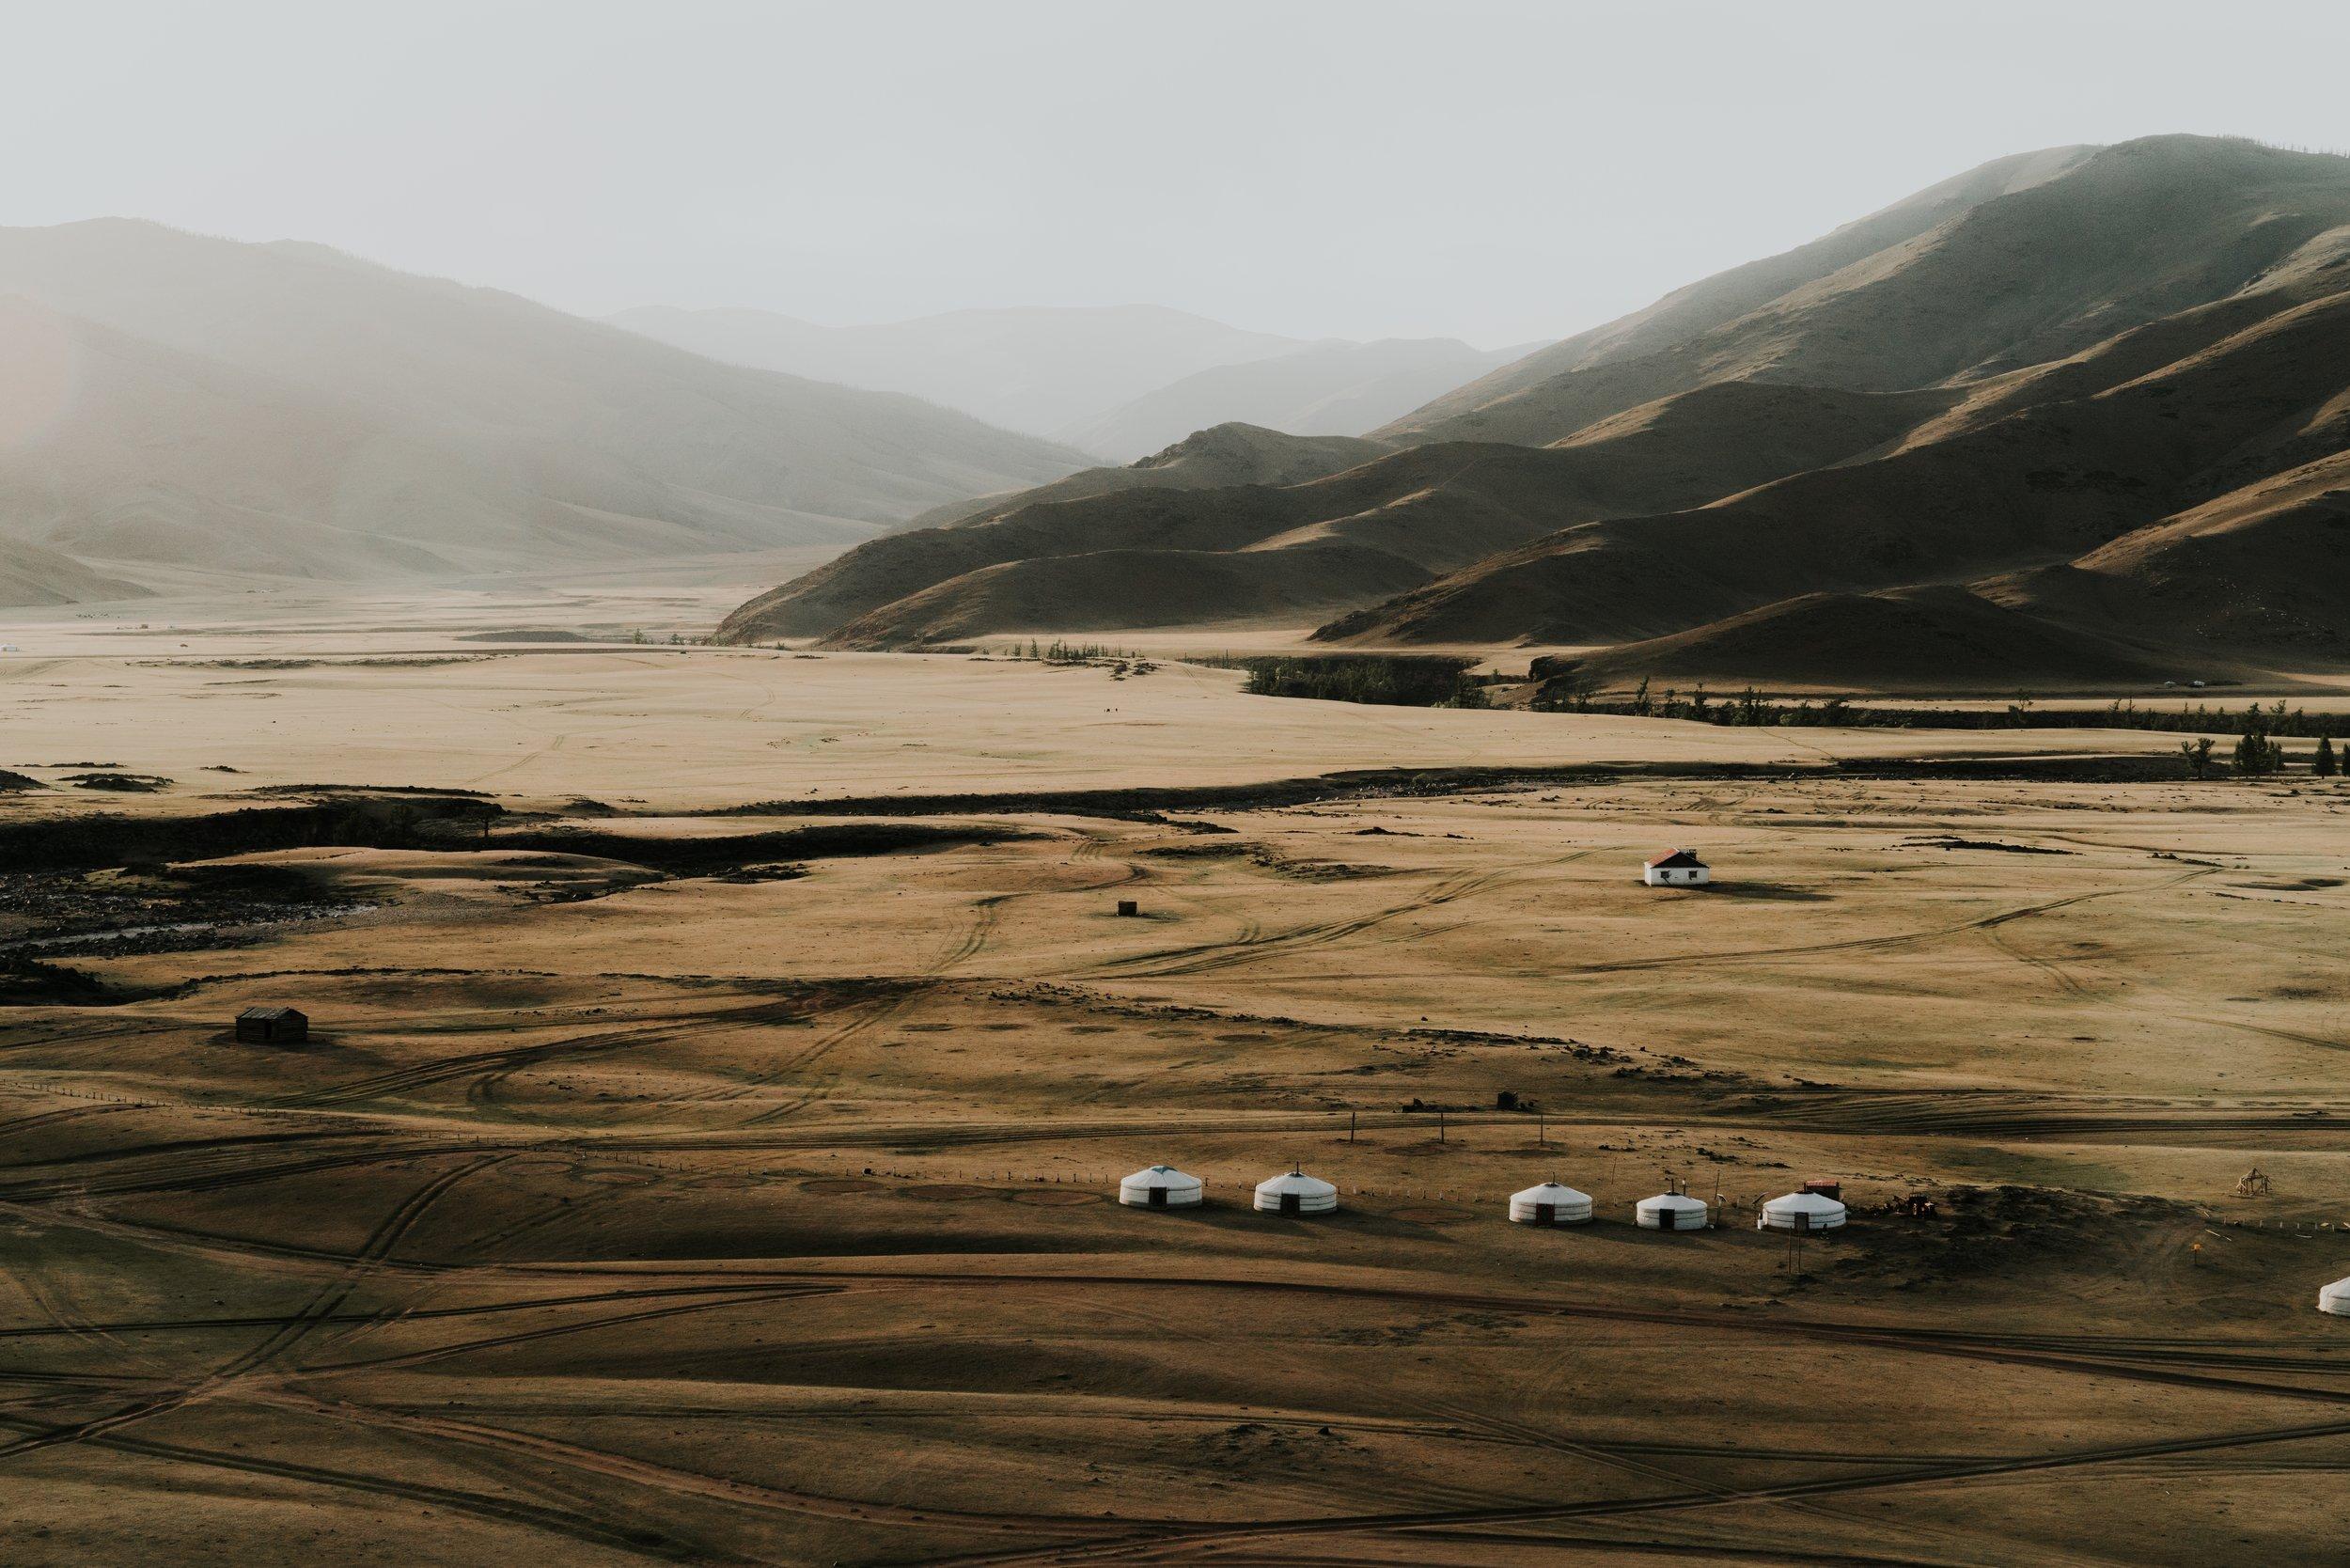 Mongolia_2018 (174 of 403) copy.jpg